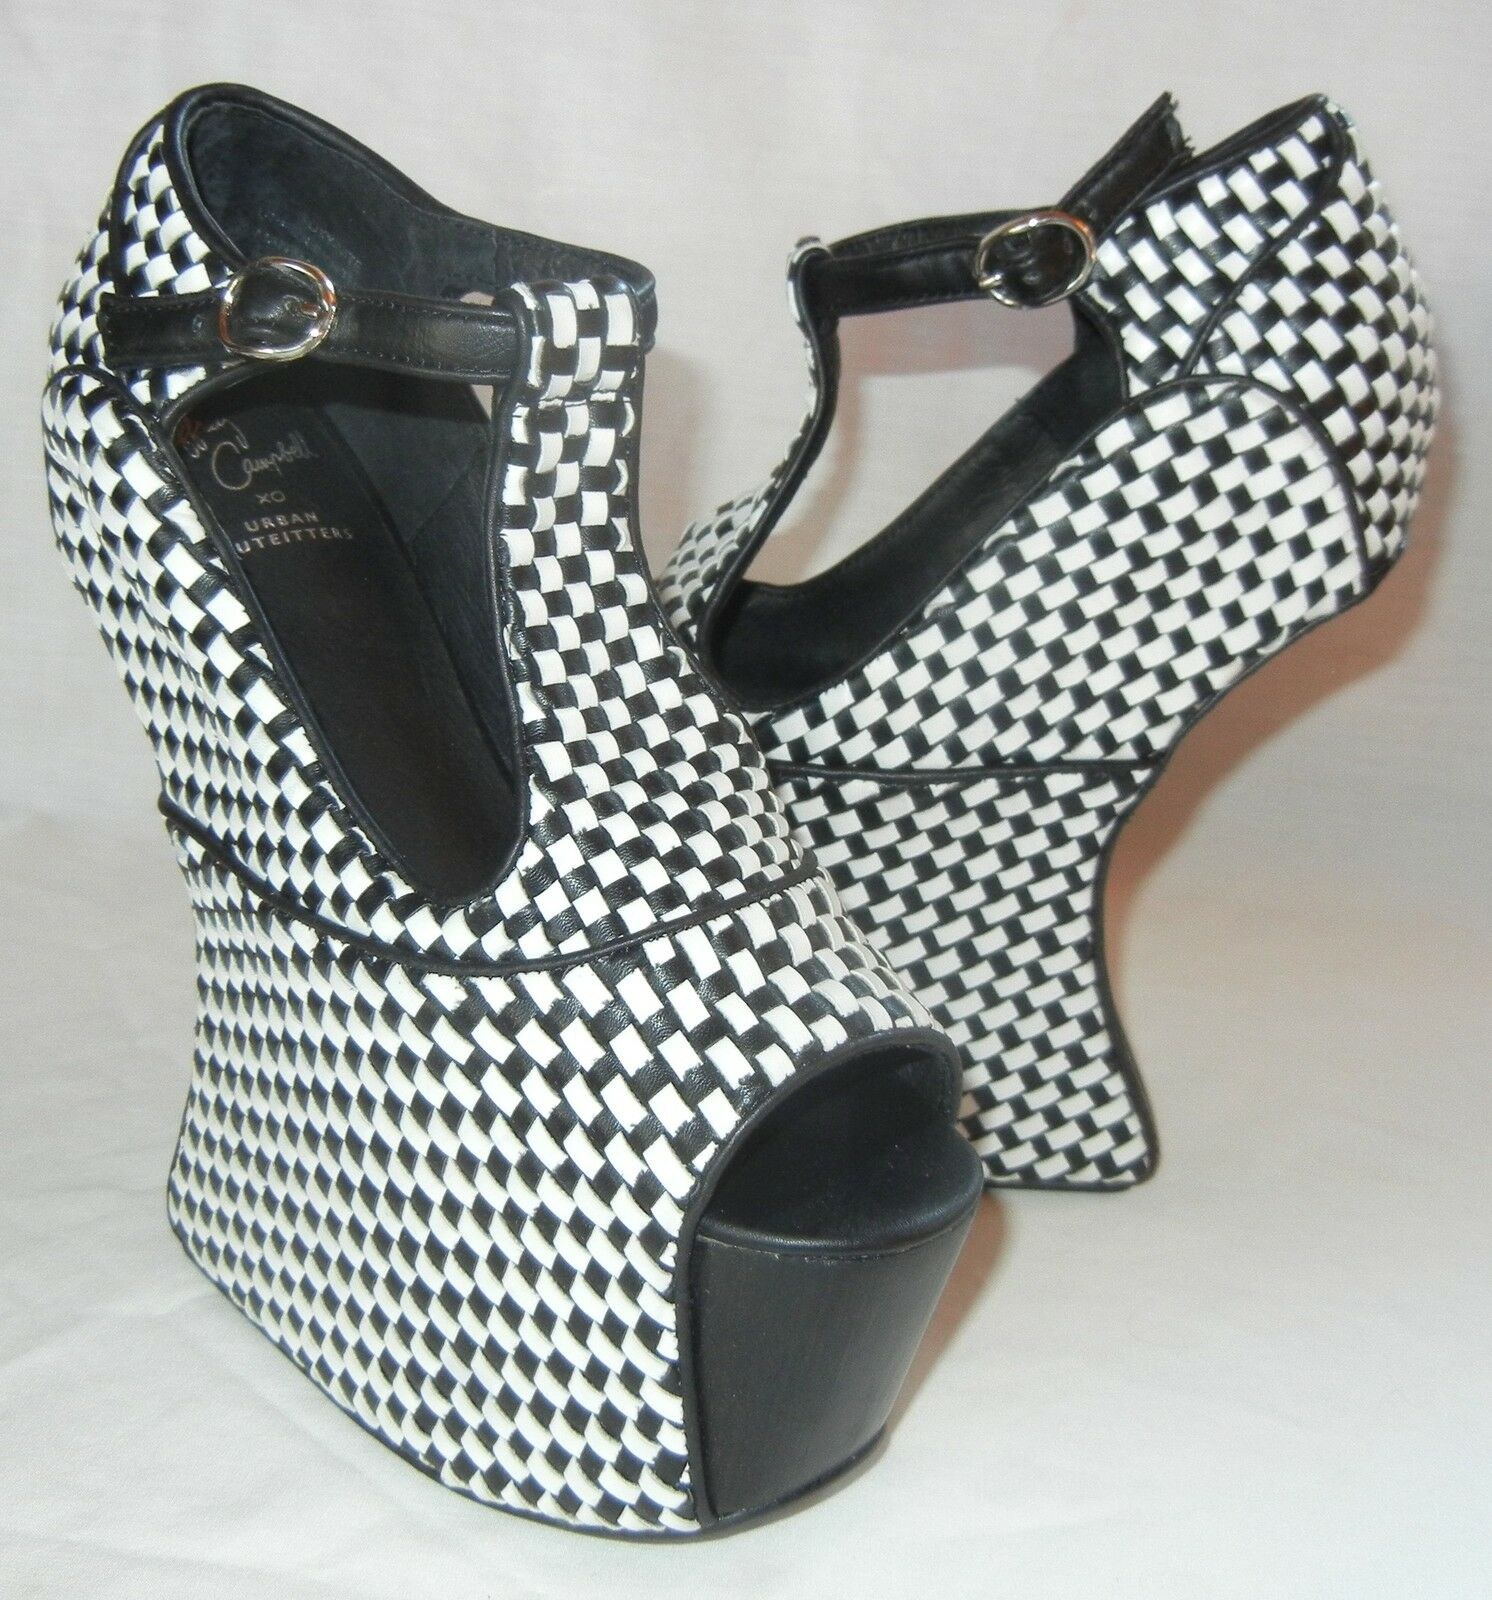 negozio online outlet Jeffrey Campbell Donna  Foxy Nite nero and bianca bianca bianca Platform Heels Dimensione 6.5  benvenuto per ordinare